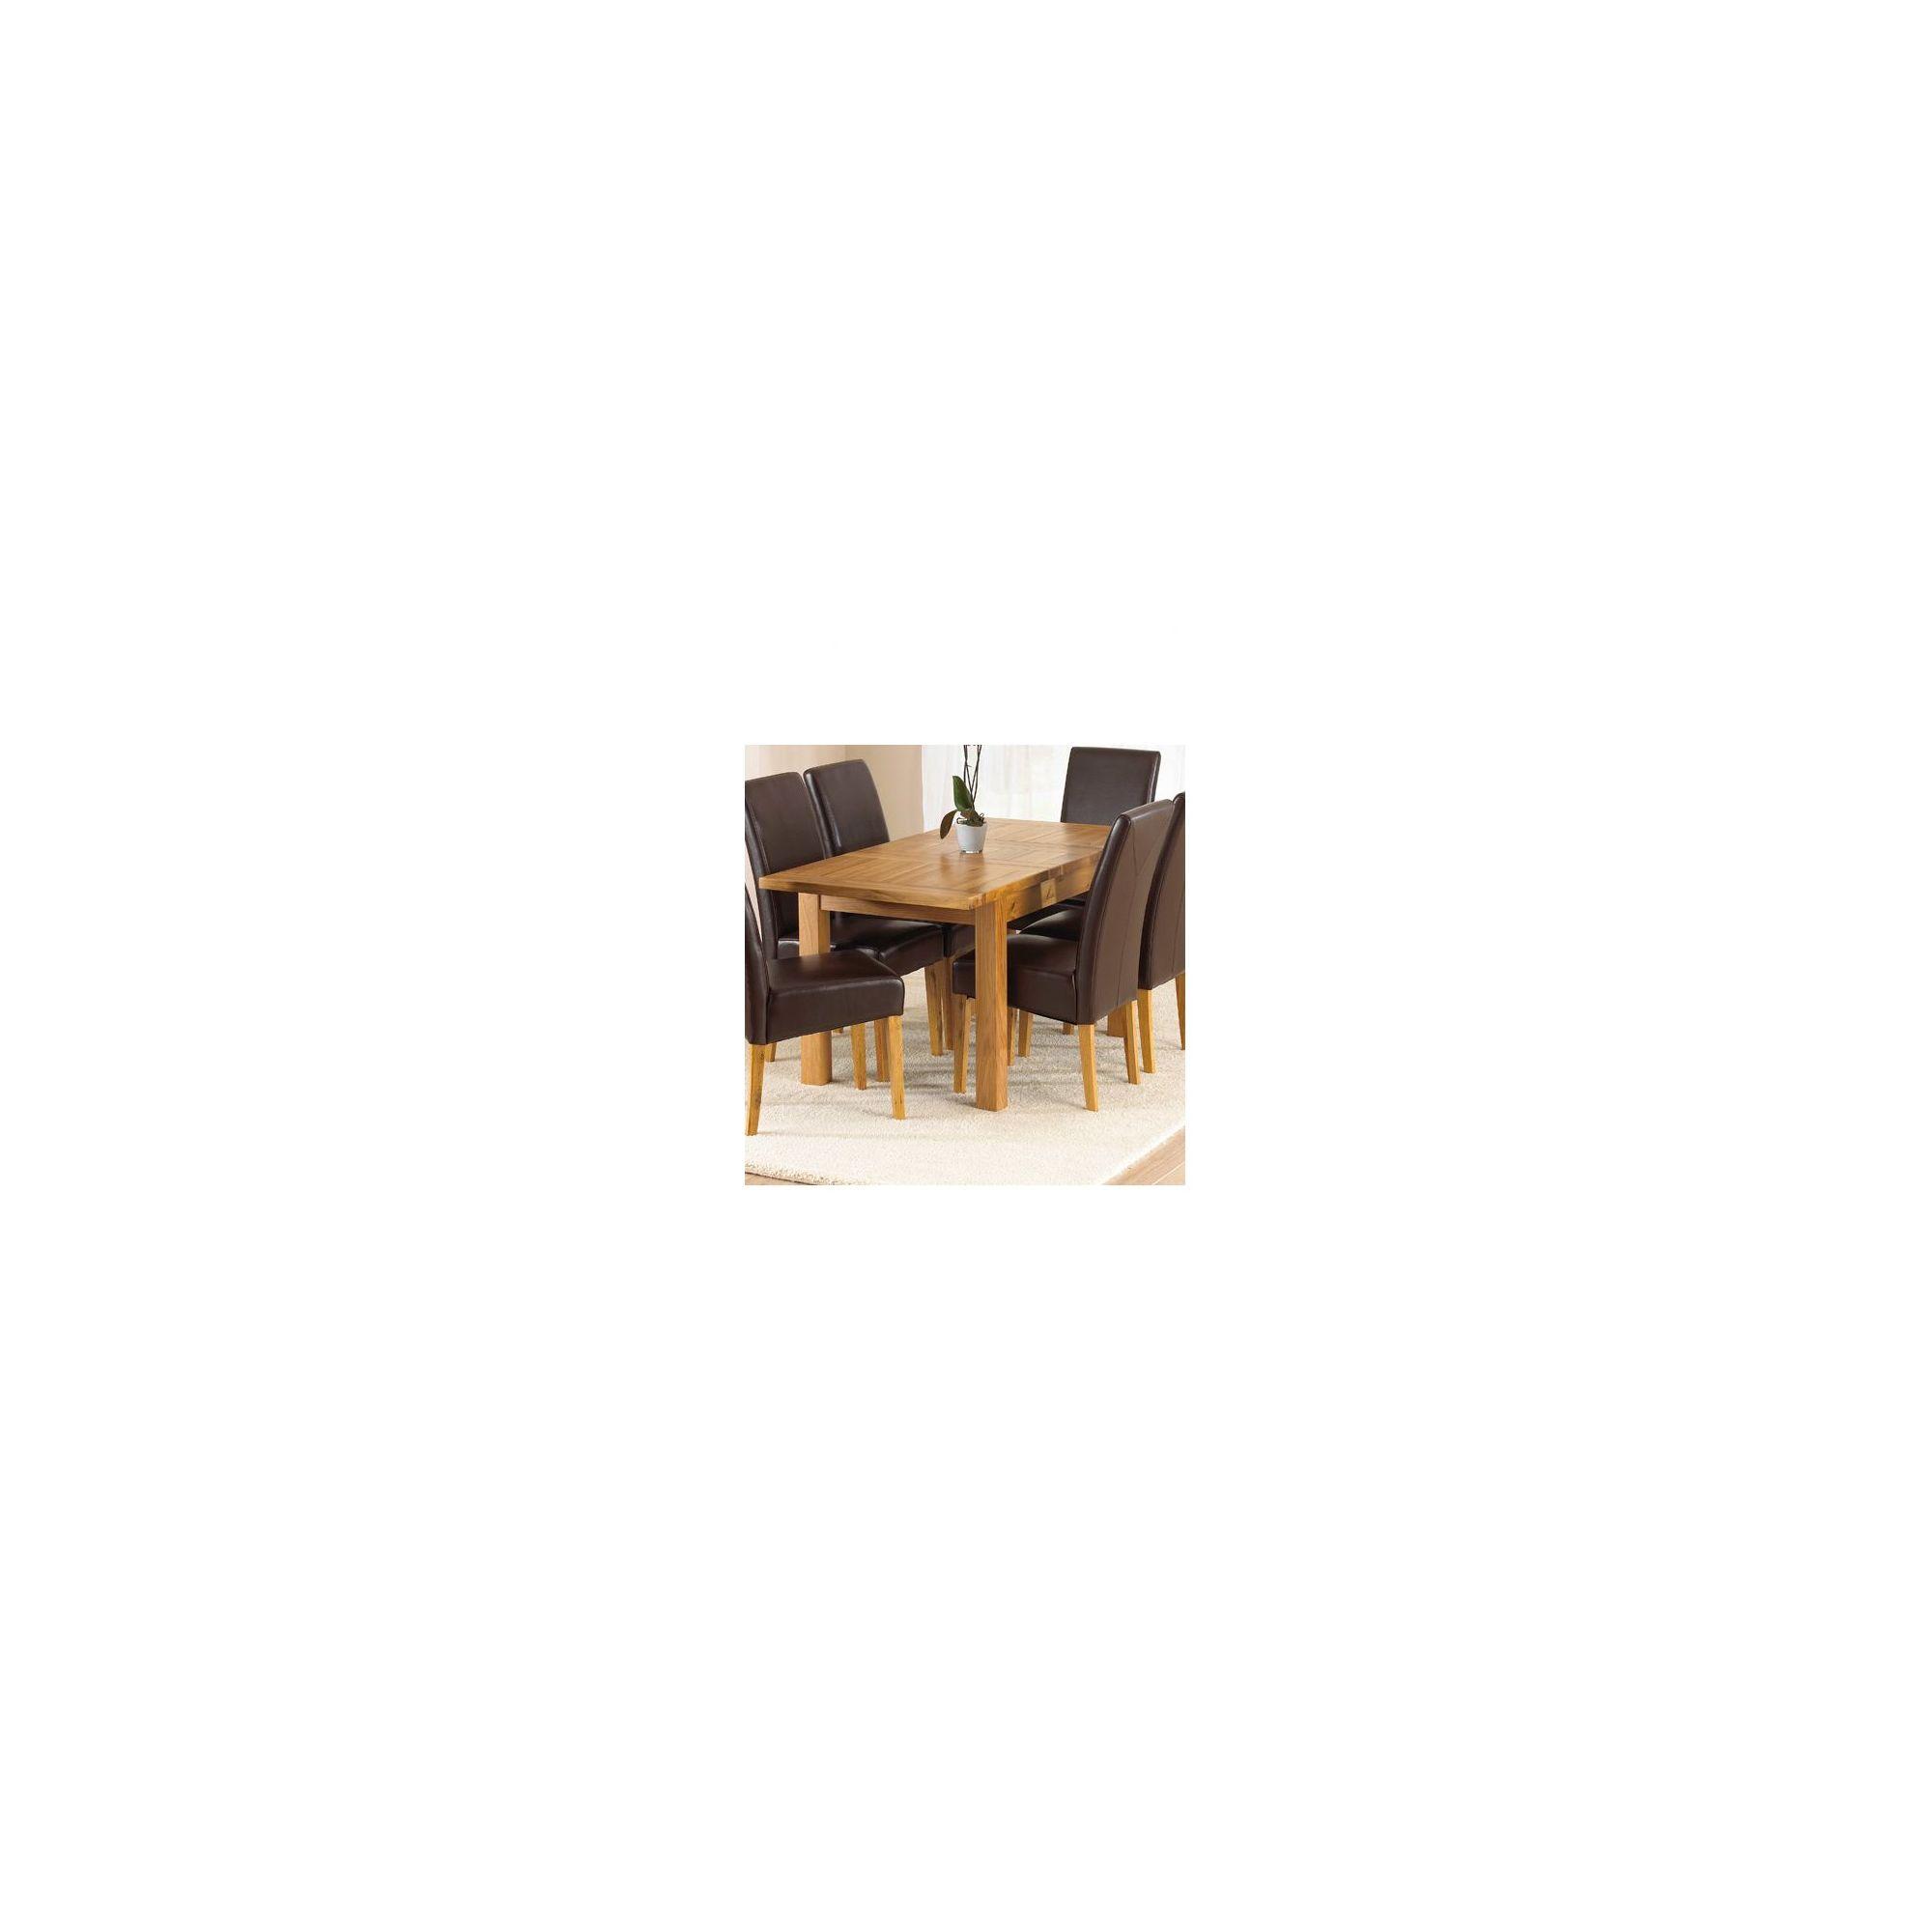 Mark Harris Furniture Rustique Classical Solid Oak Dining Table - 150 cm